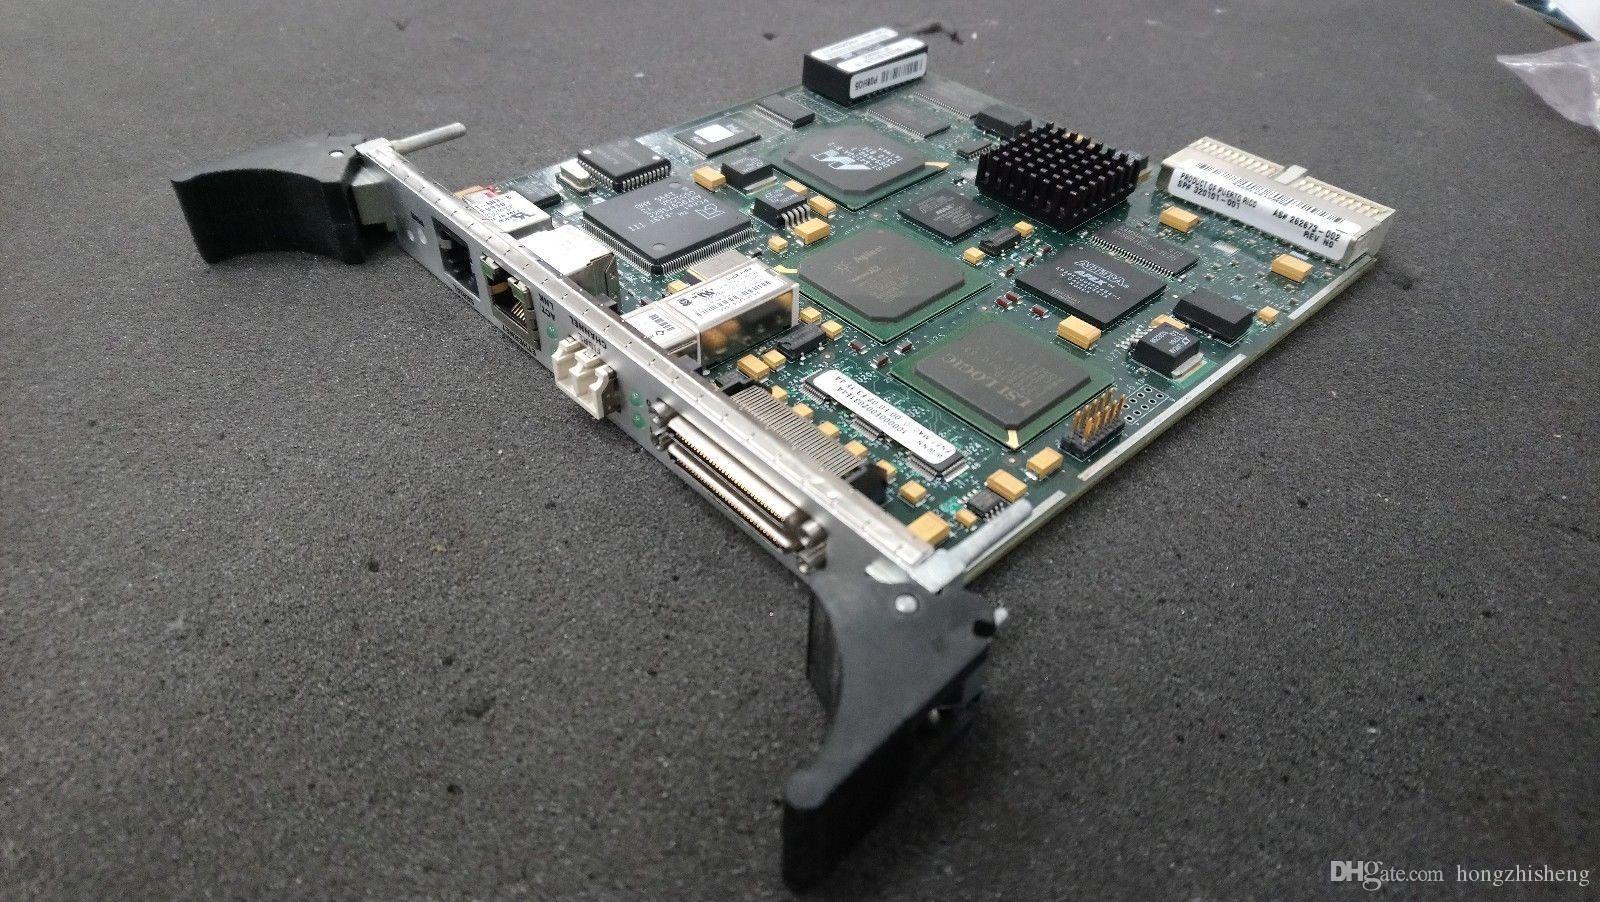 320101-001 262673-002 сети StorageWorks MSL6000 маршрутизатор для хранения MSL6030 и MSL6060